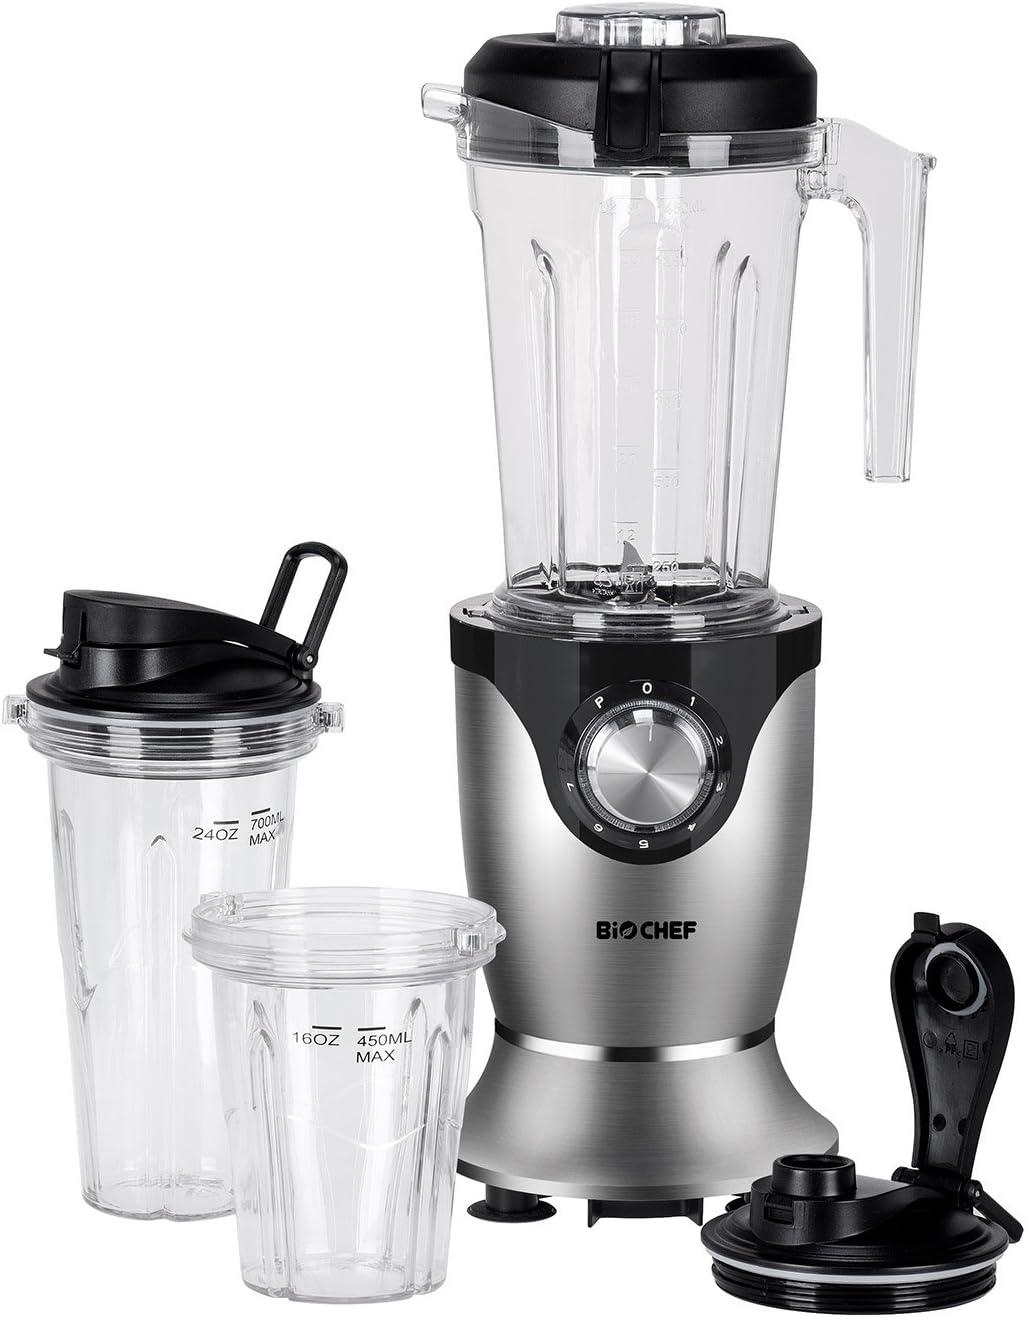 BioChef Galaxy – Batidora de vaso americana + Personal blender | 1.45L + 2 vasos 700ml y 400ml | 35.000 RPM | BPA Free: Amazon.es: Hogar